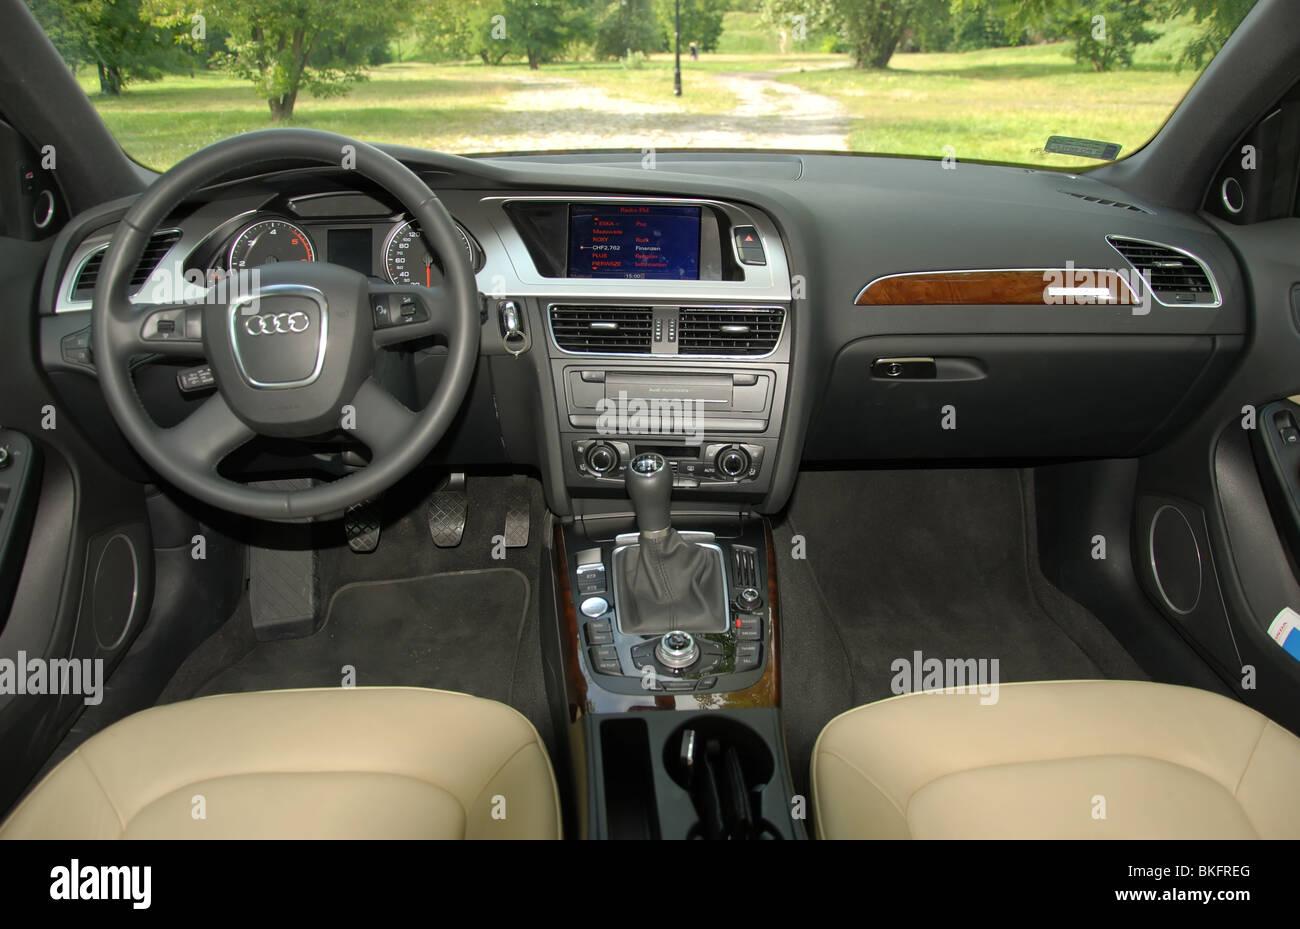 Audi A4 Allroad 2.0 TDI (Quattro) - 2009 - deutsche Premium ...